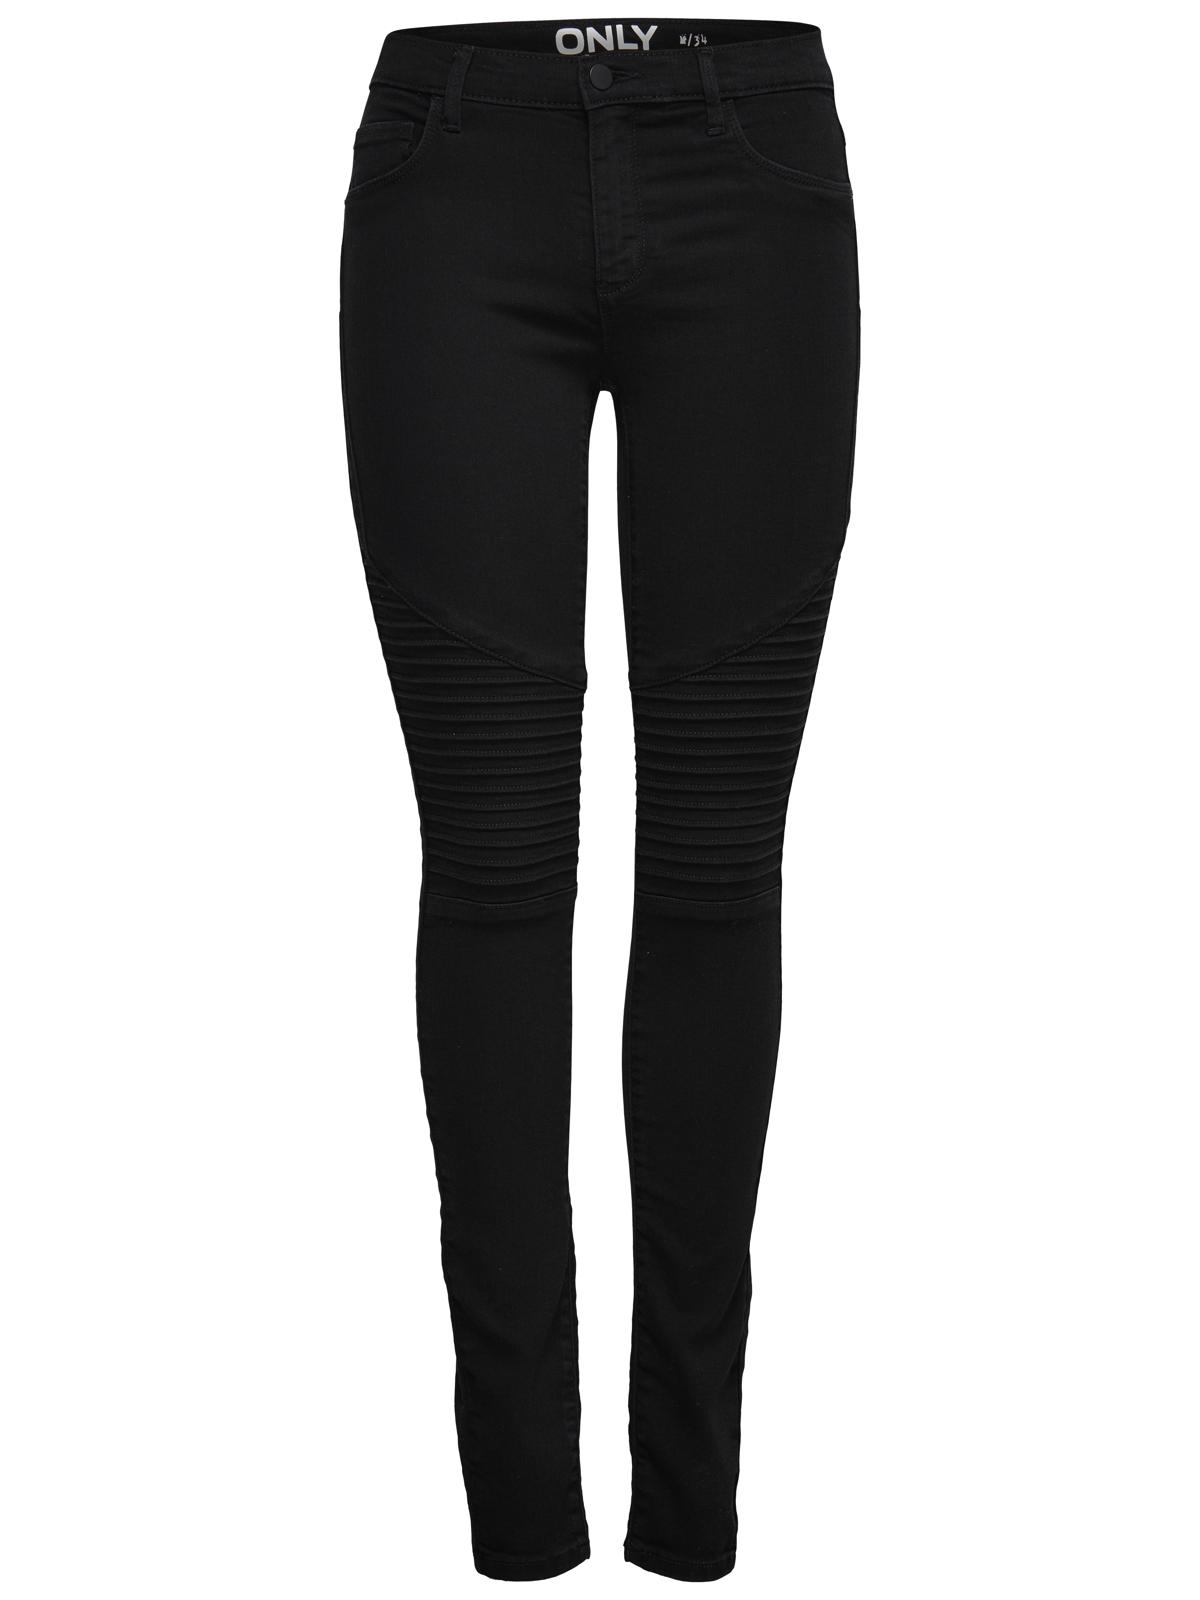 only damen hose onlrain reg sk fresh biker jeans xs xl schwarz damen jeans. Black Bedroom Furniture Sets. Home Design Ideas